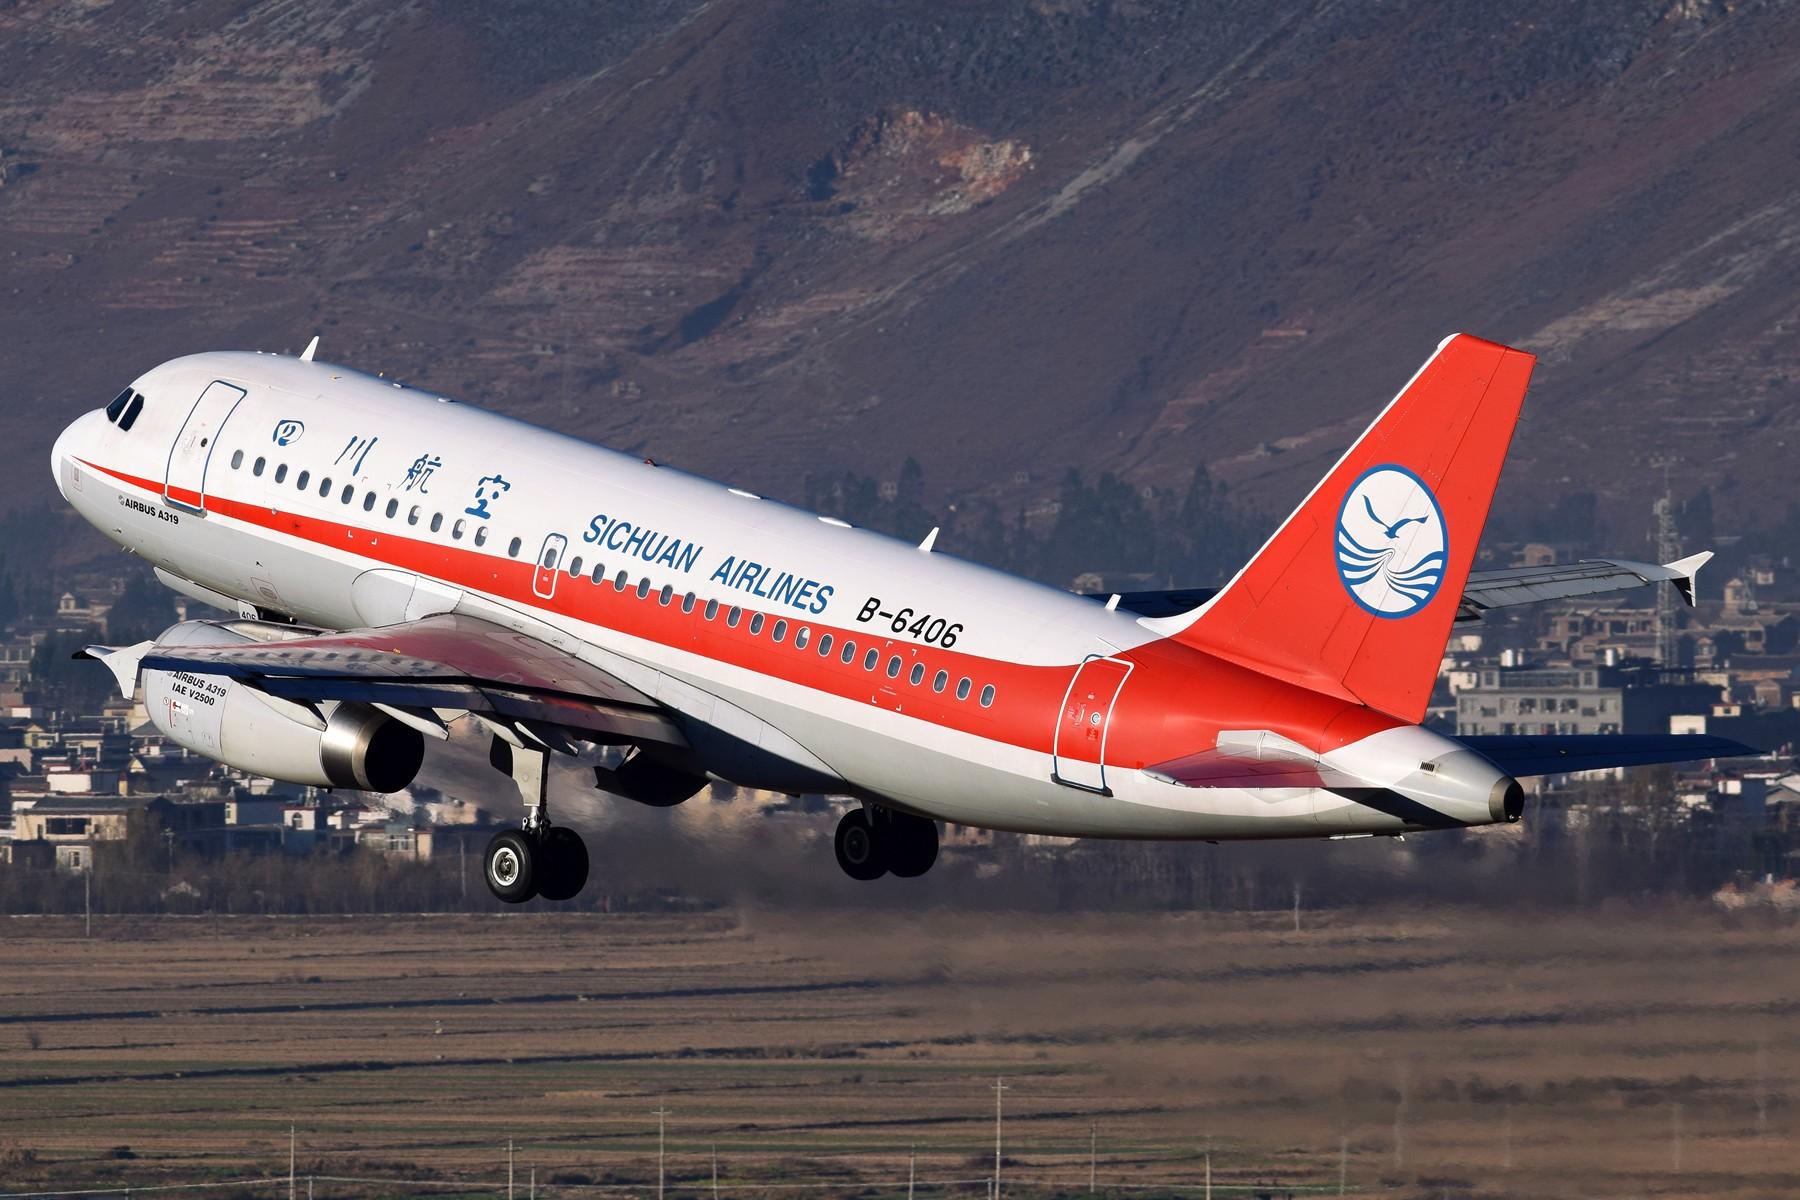 Re:[原创]补发的拍机游记---Day Trip for 丽江三义 AIRBUS A319-100 B-6406 中国丽江三义机场